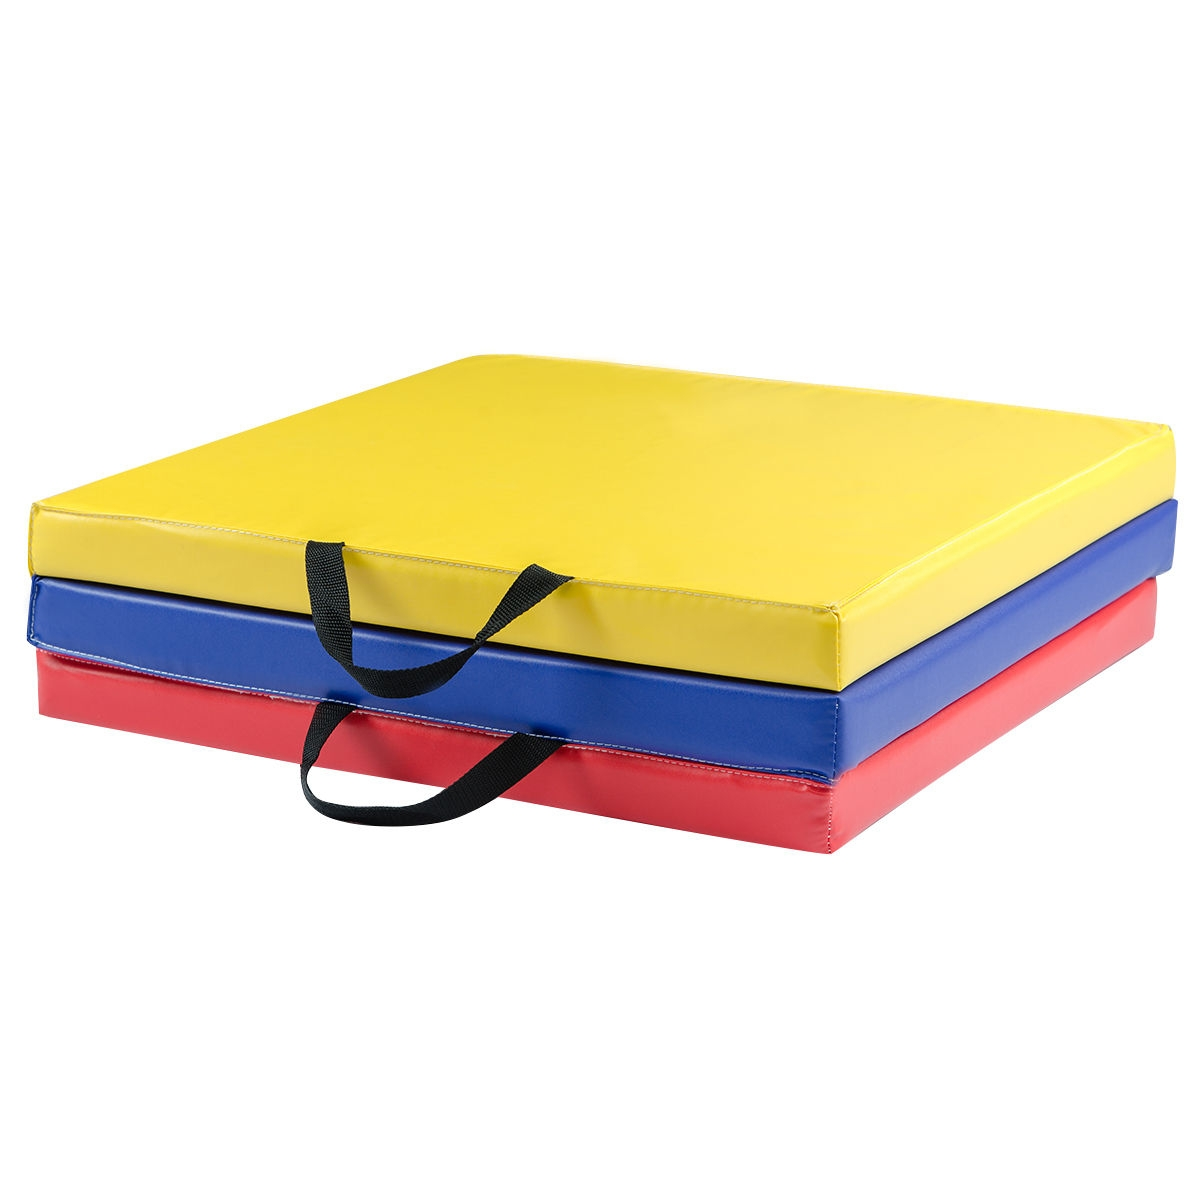 6' x 2' Exercise Tri-Fold Gymnastics Mat w/ Carrying Handles